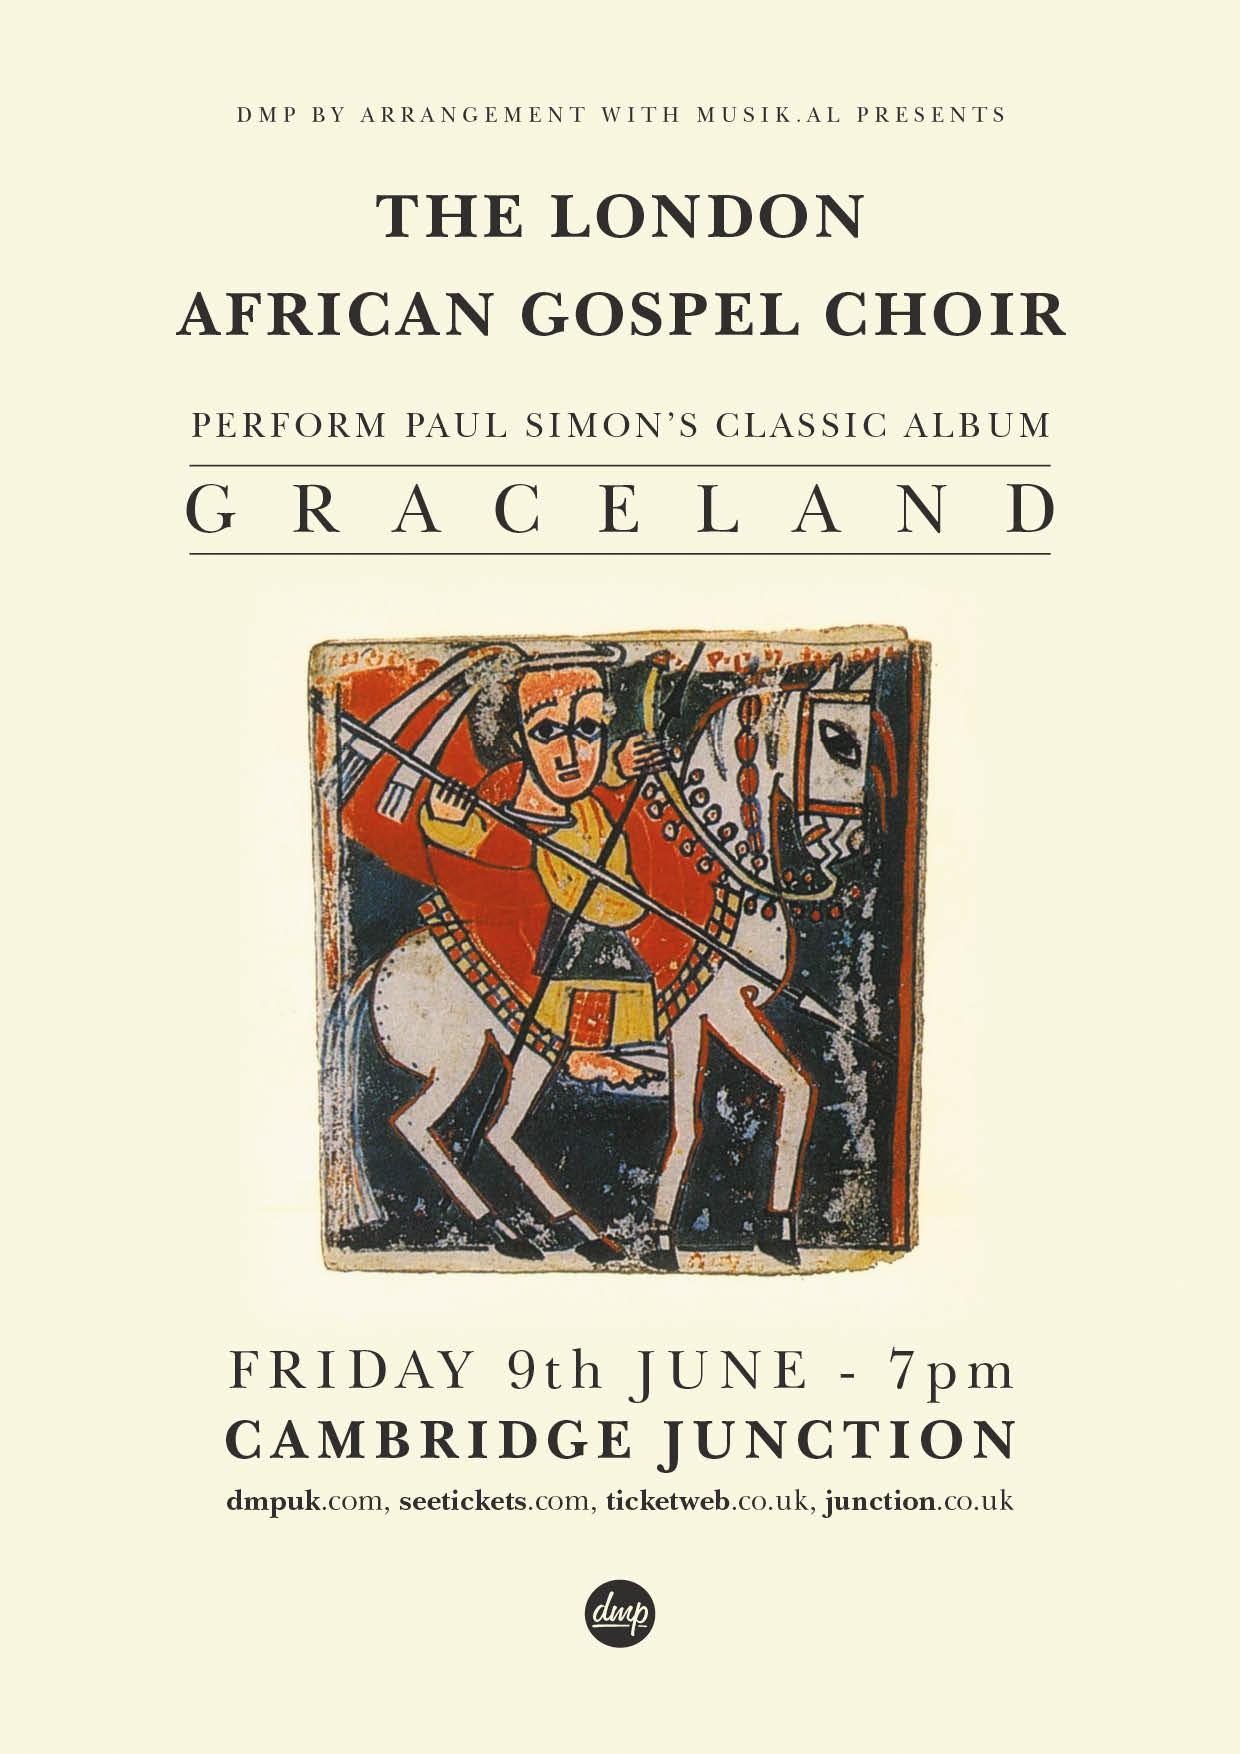 The London African Gospel Choir Perform Paul Simon's Classic Album 'Graceland'